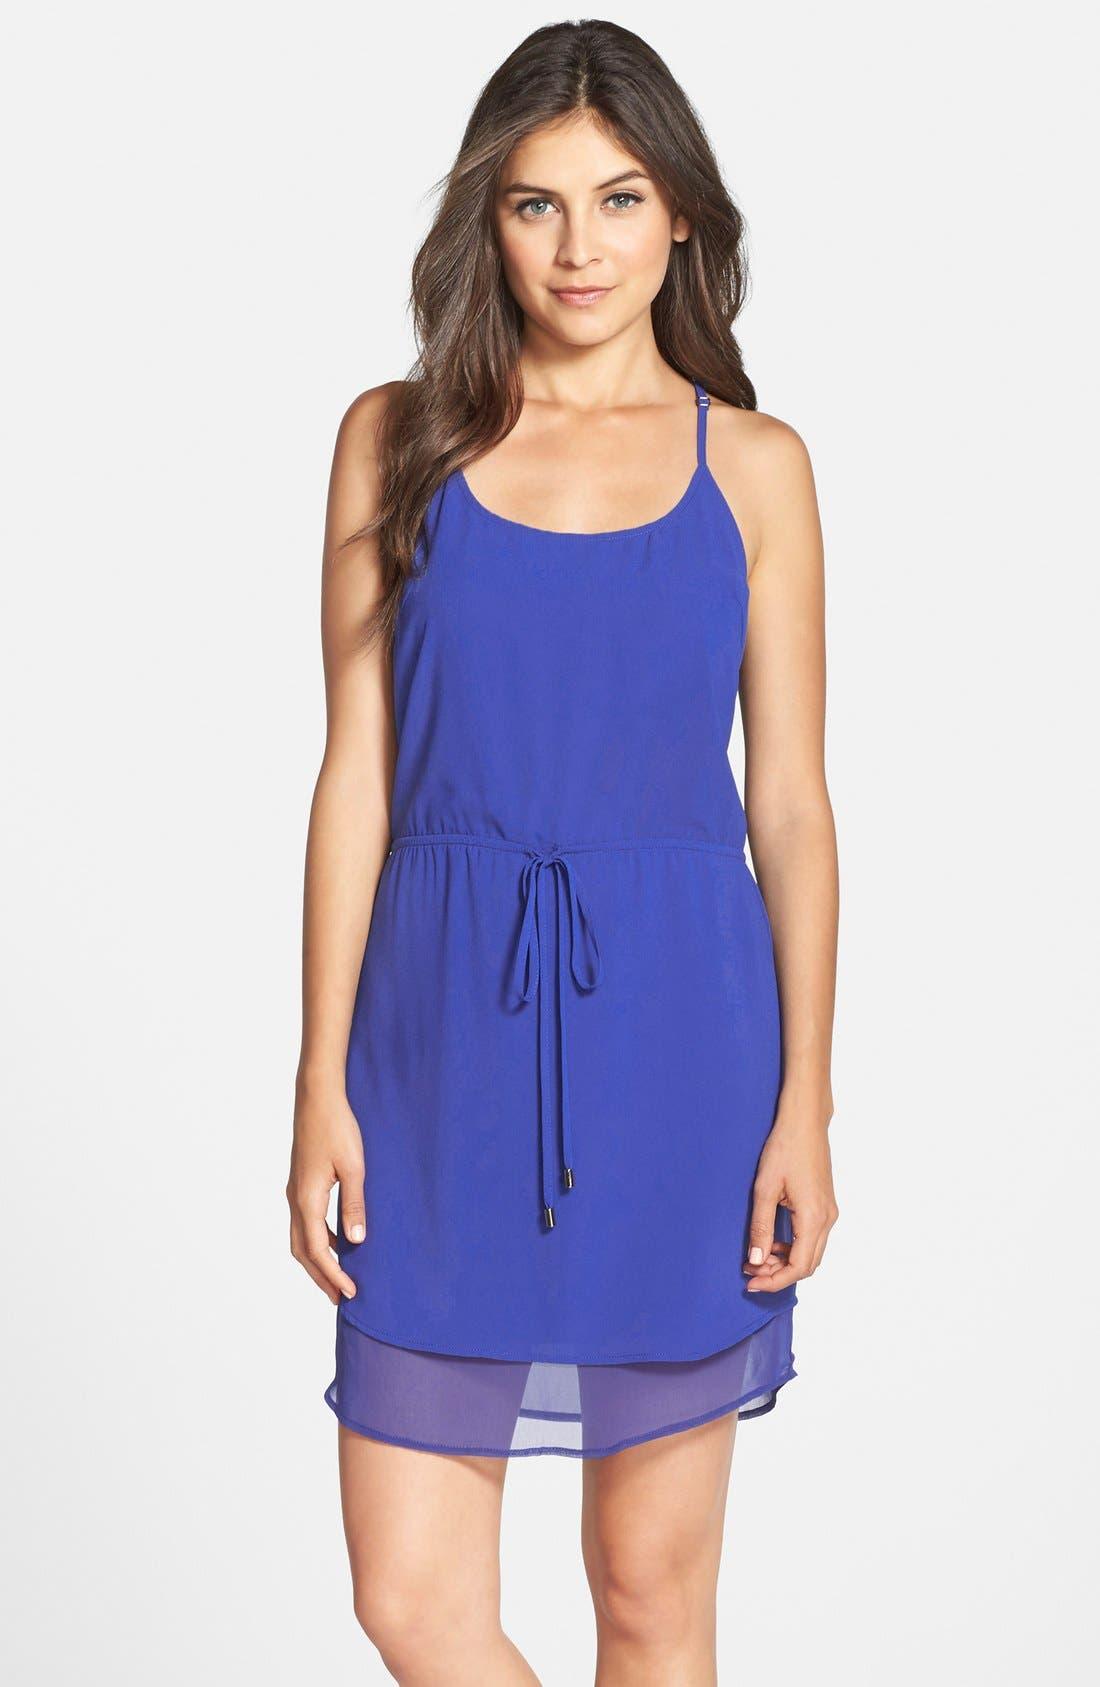 Alternate Image 1 Selected - Adelyn Rae Layered Drawstring Chiffon Dress